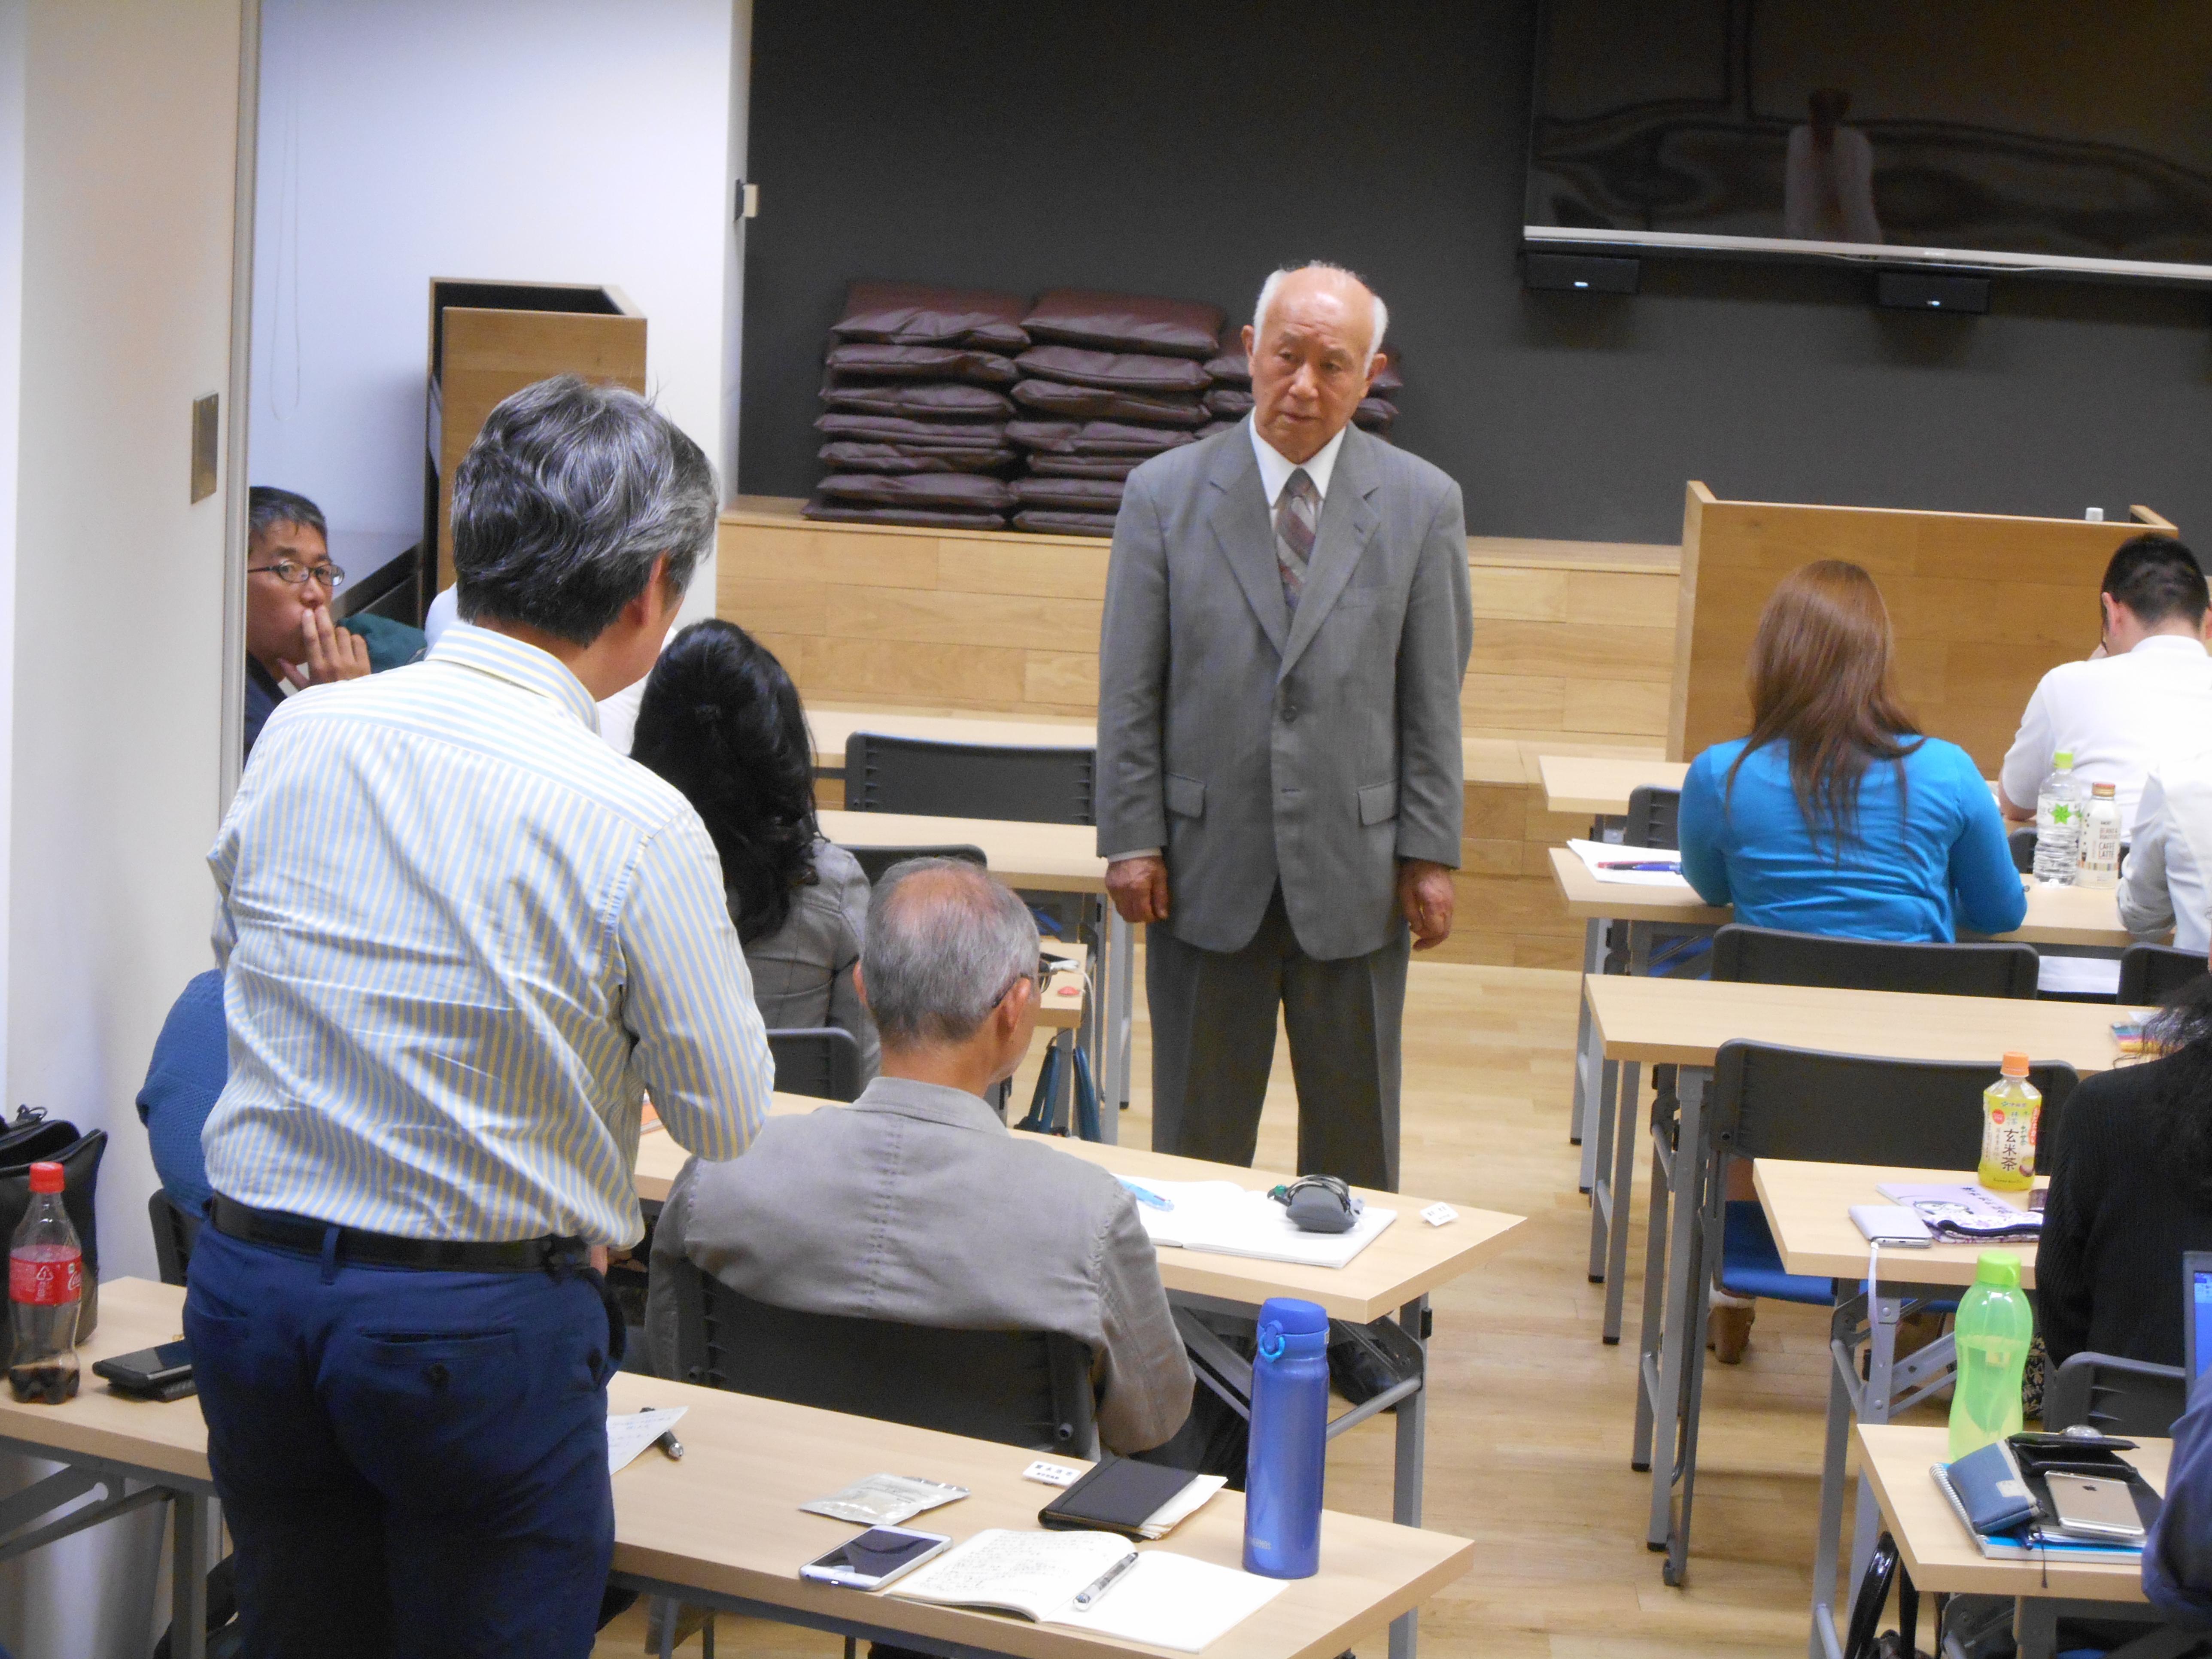 DSCN1717 - 4月1日東京思風塾の開催になります。